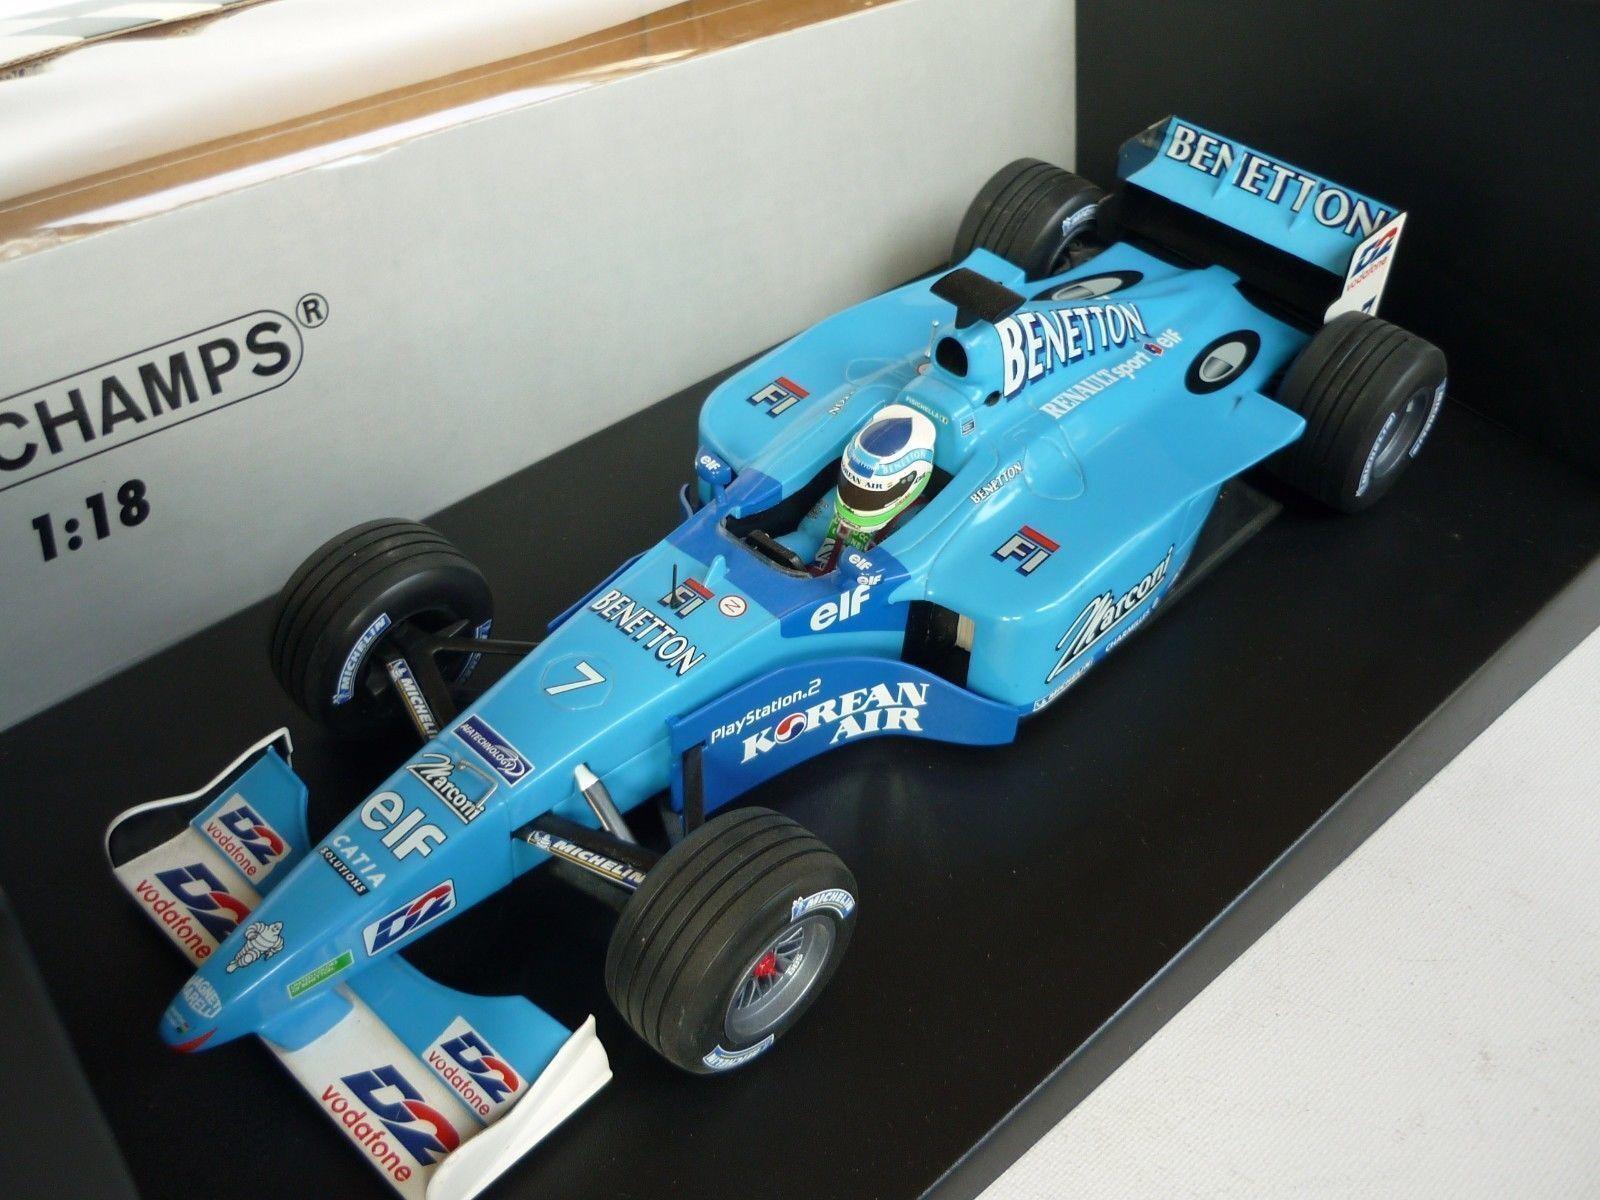 Benetton - renault showcar 2001 g. fisitchella 2001 minichamps 1   18 180010097